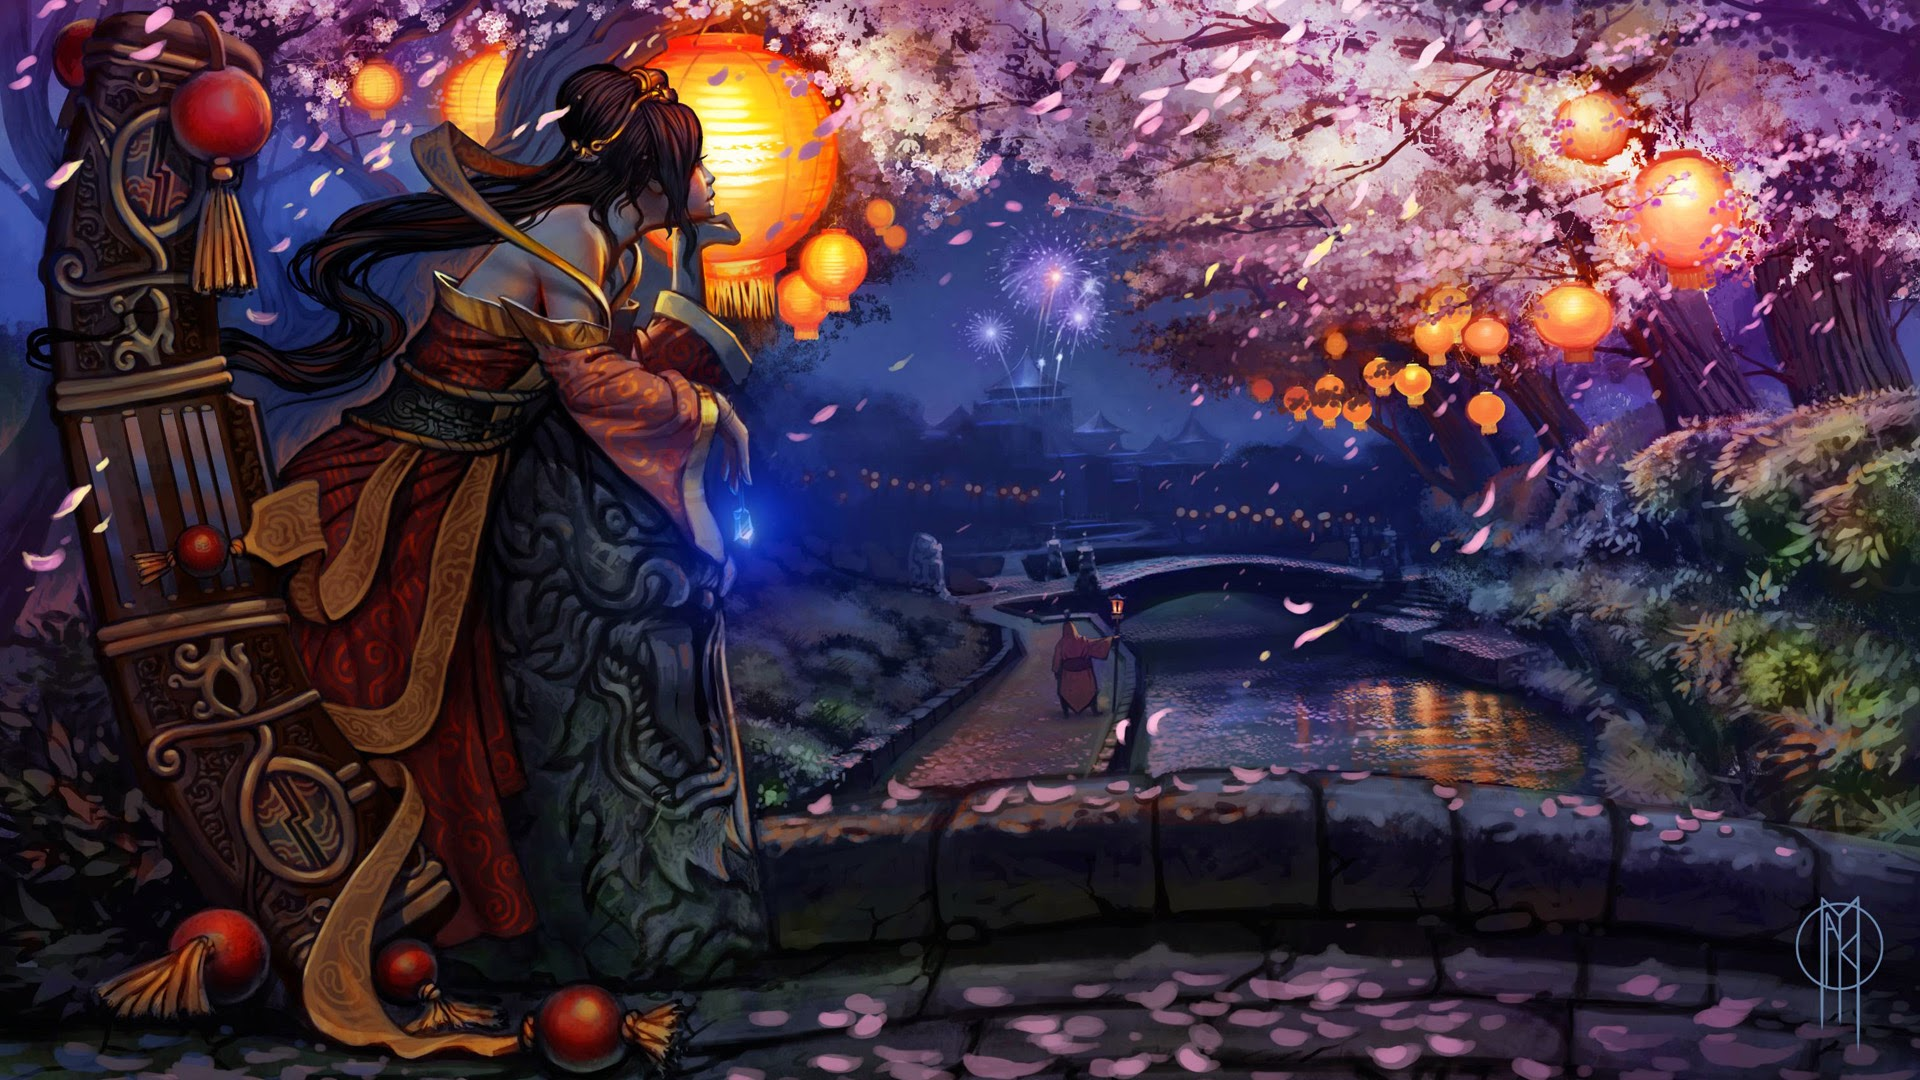 sona hd wallpaper league of legends champion lol cherry blossom    Sona Champion